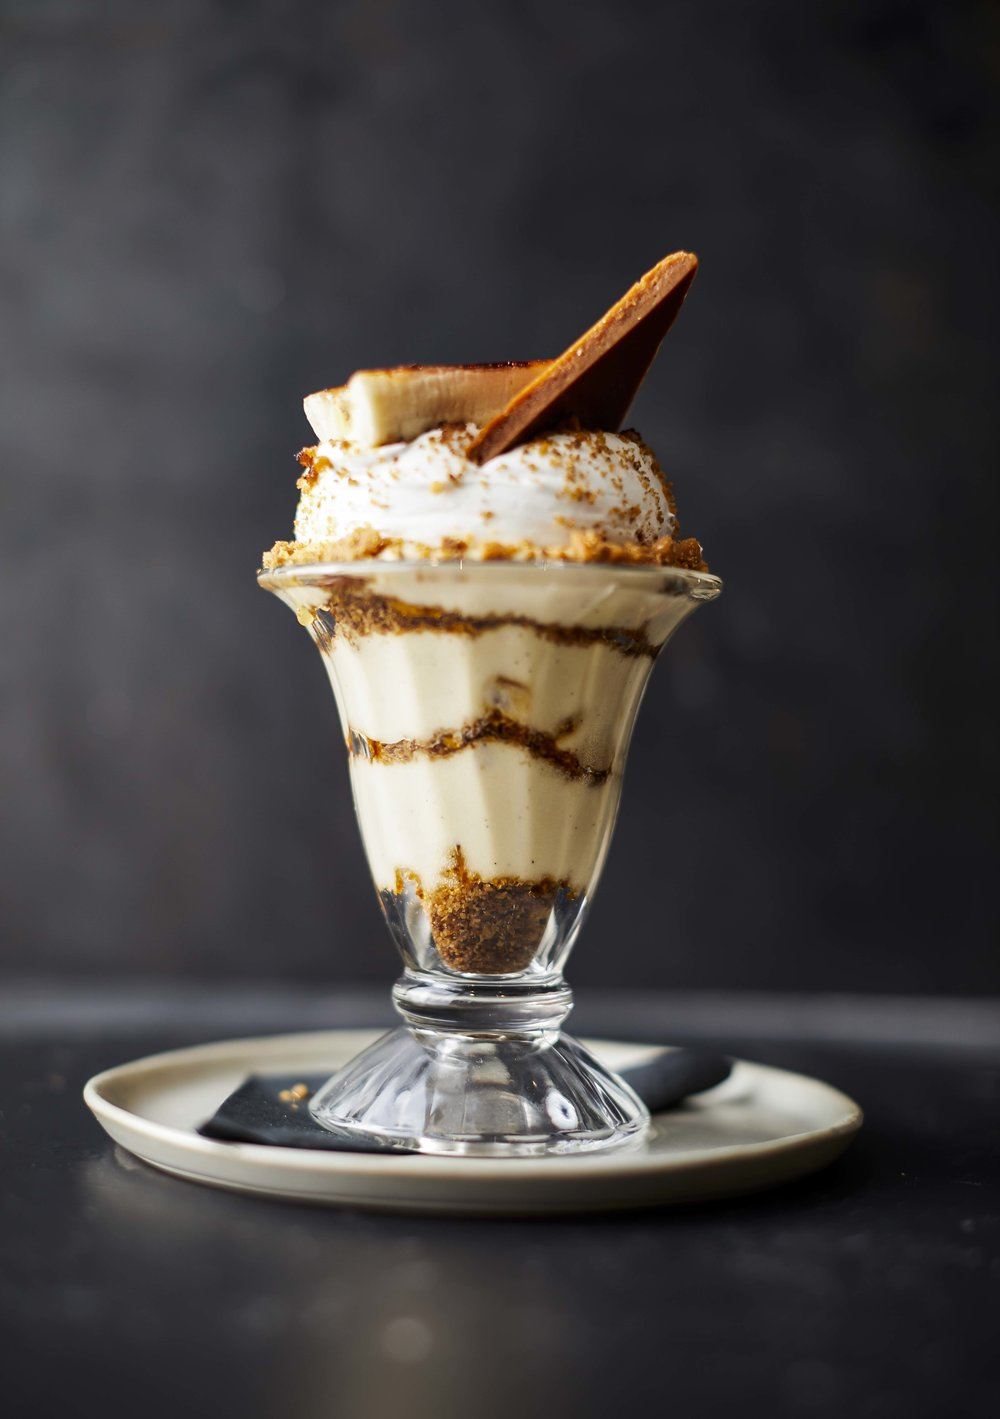 The Makeready Libations & Liberation Lemon Tart features a pistachio crust, hibiscus, meringue, and Coconut sorbet.